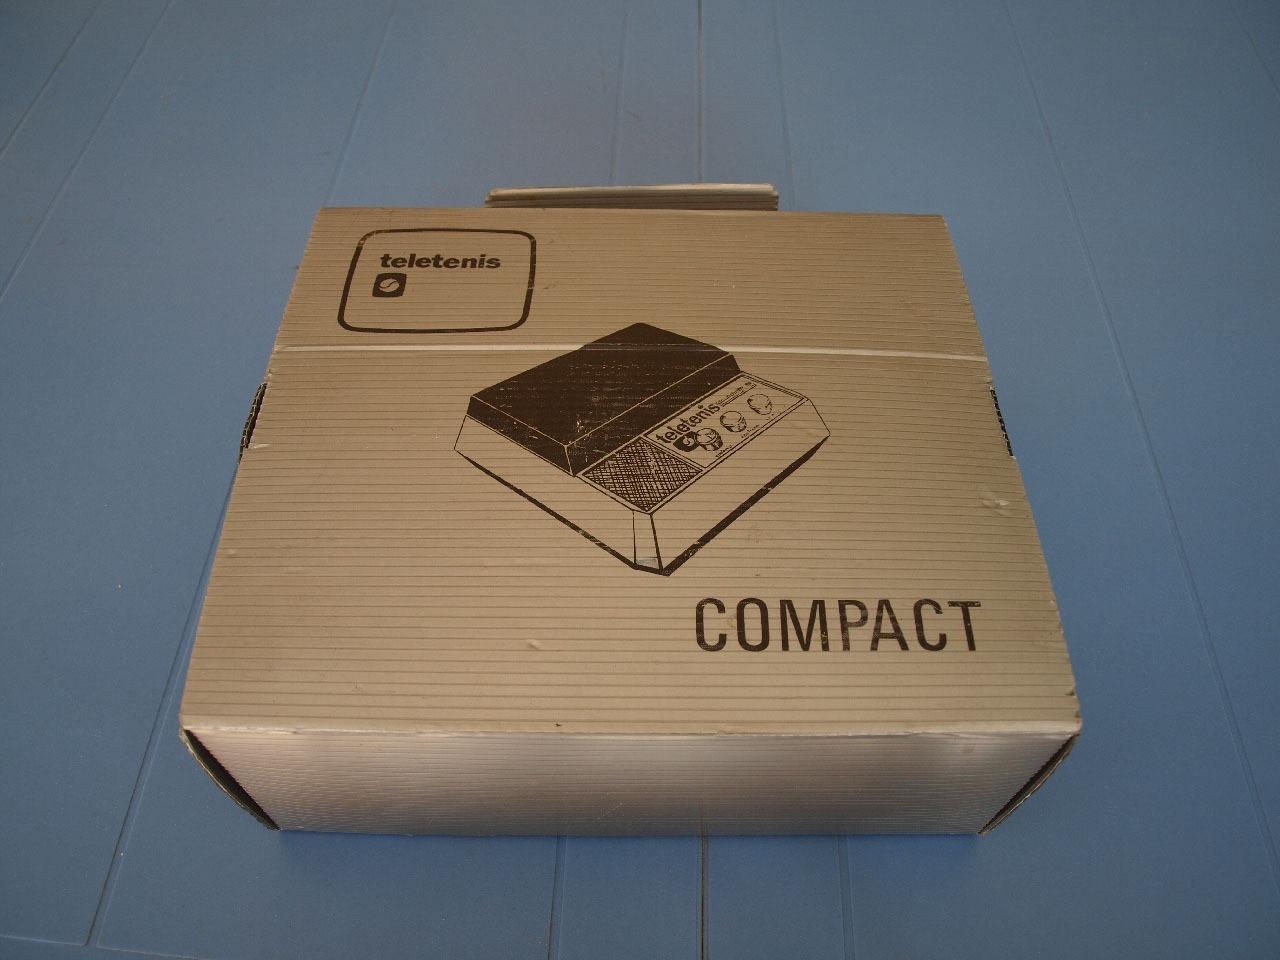 Teletenis Compact, retrounboxing y gameplay 2